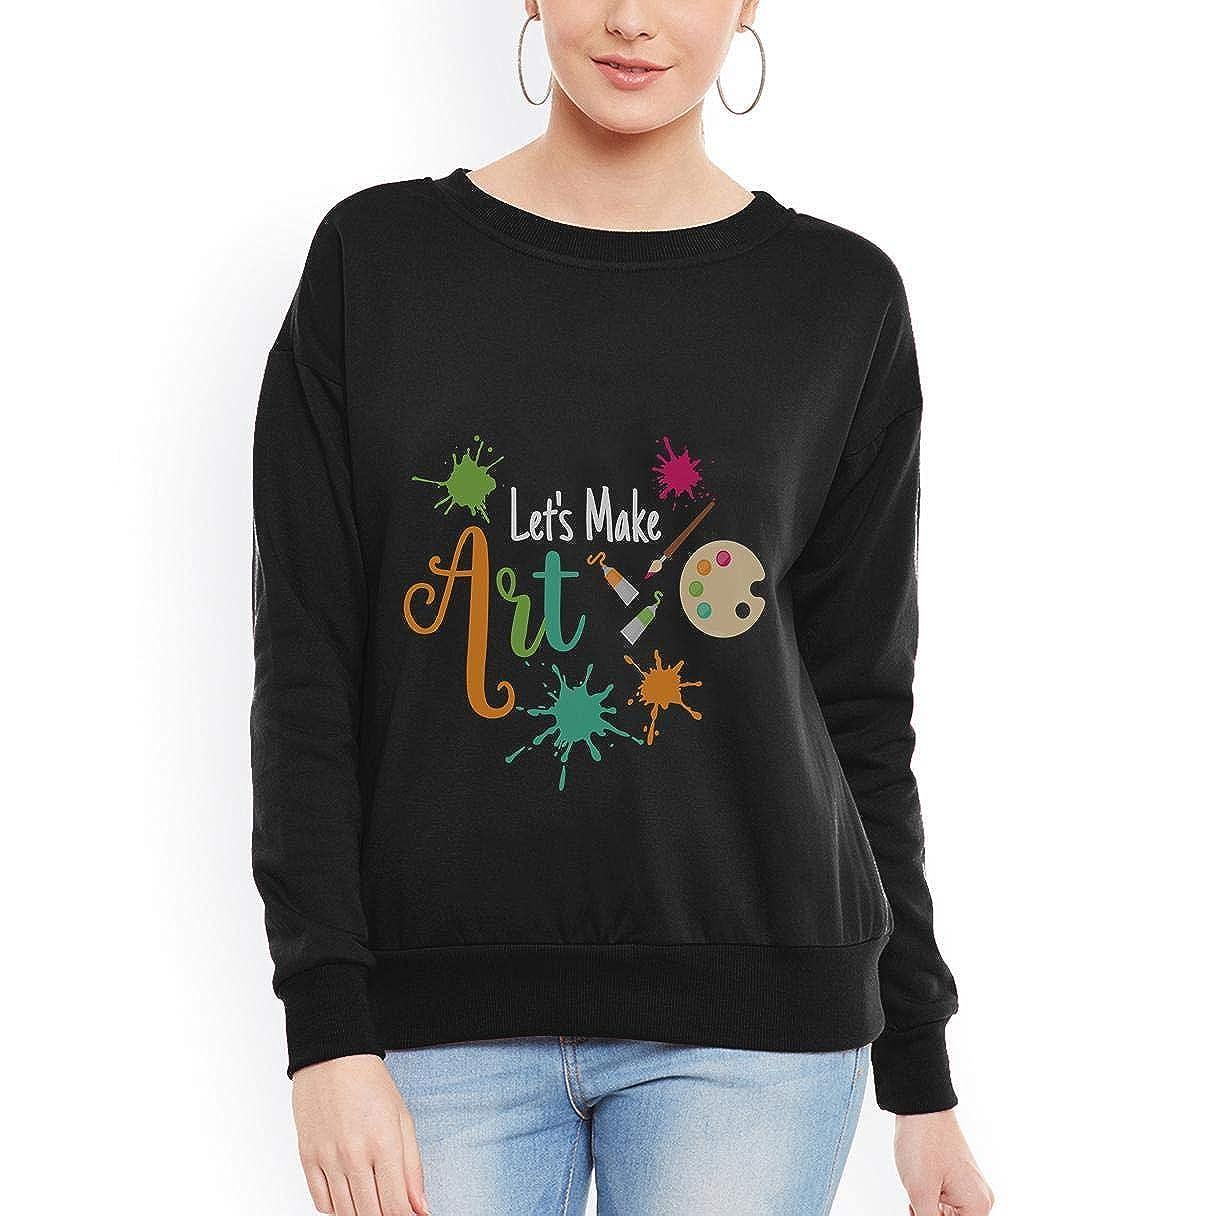 Lets Make Art Funny Women Sweatshirt tee